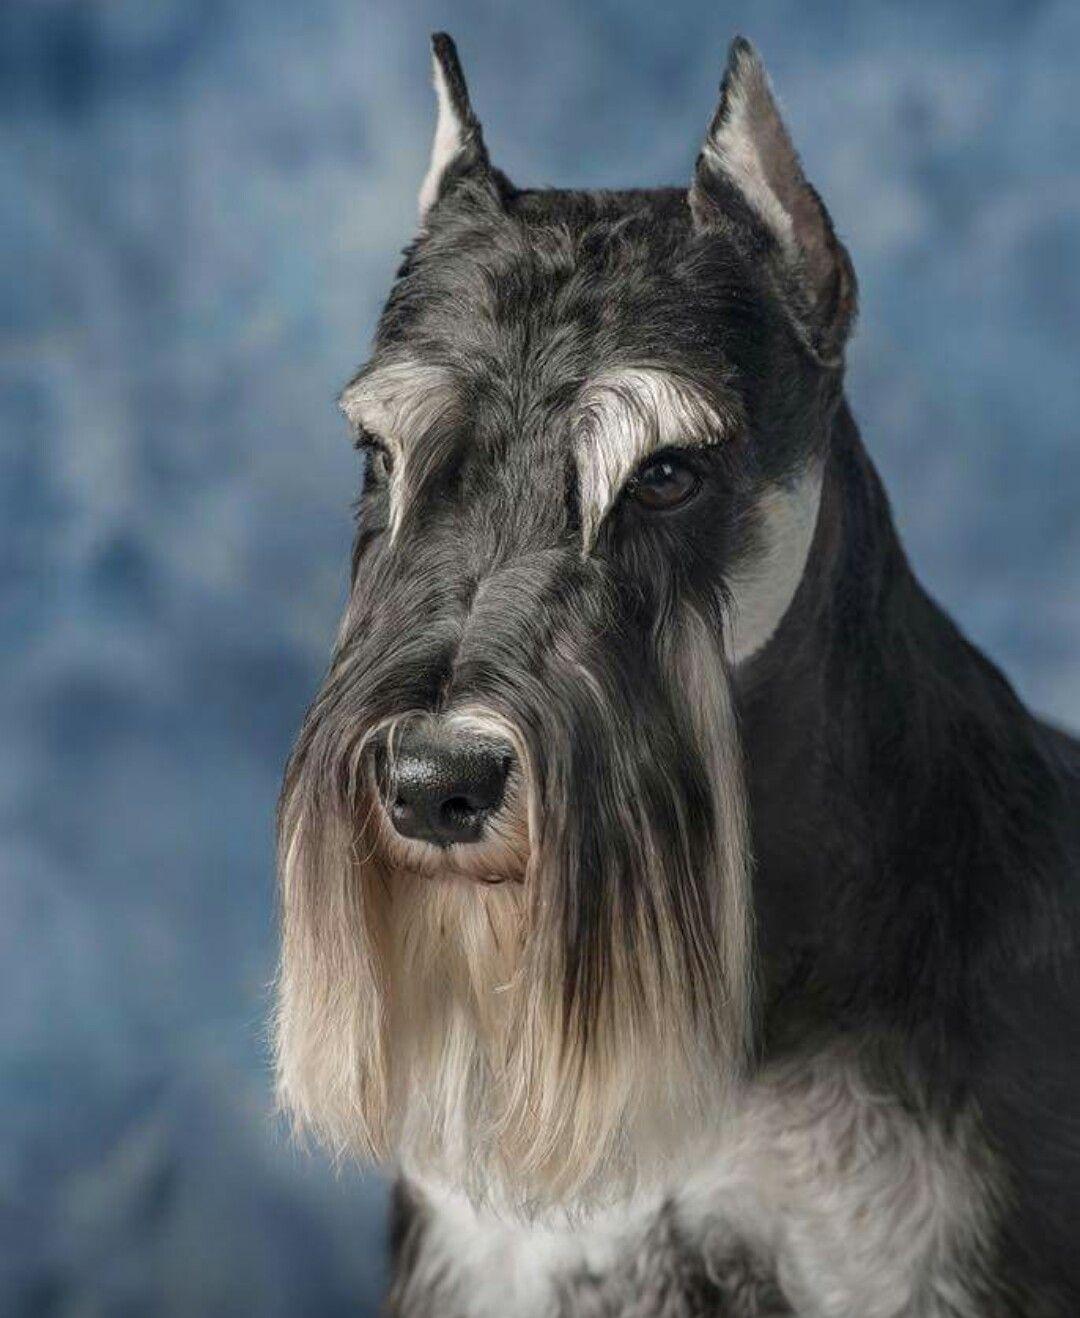 Schnauzer face | Schnauzer breed, Schnauzer, Dog grooming